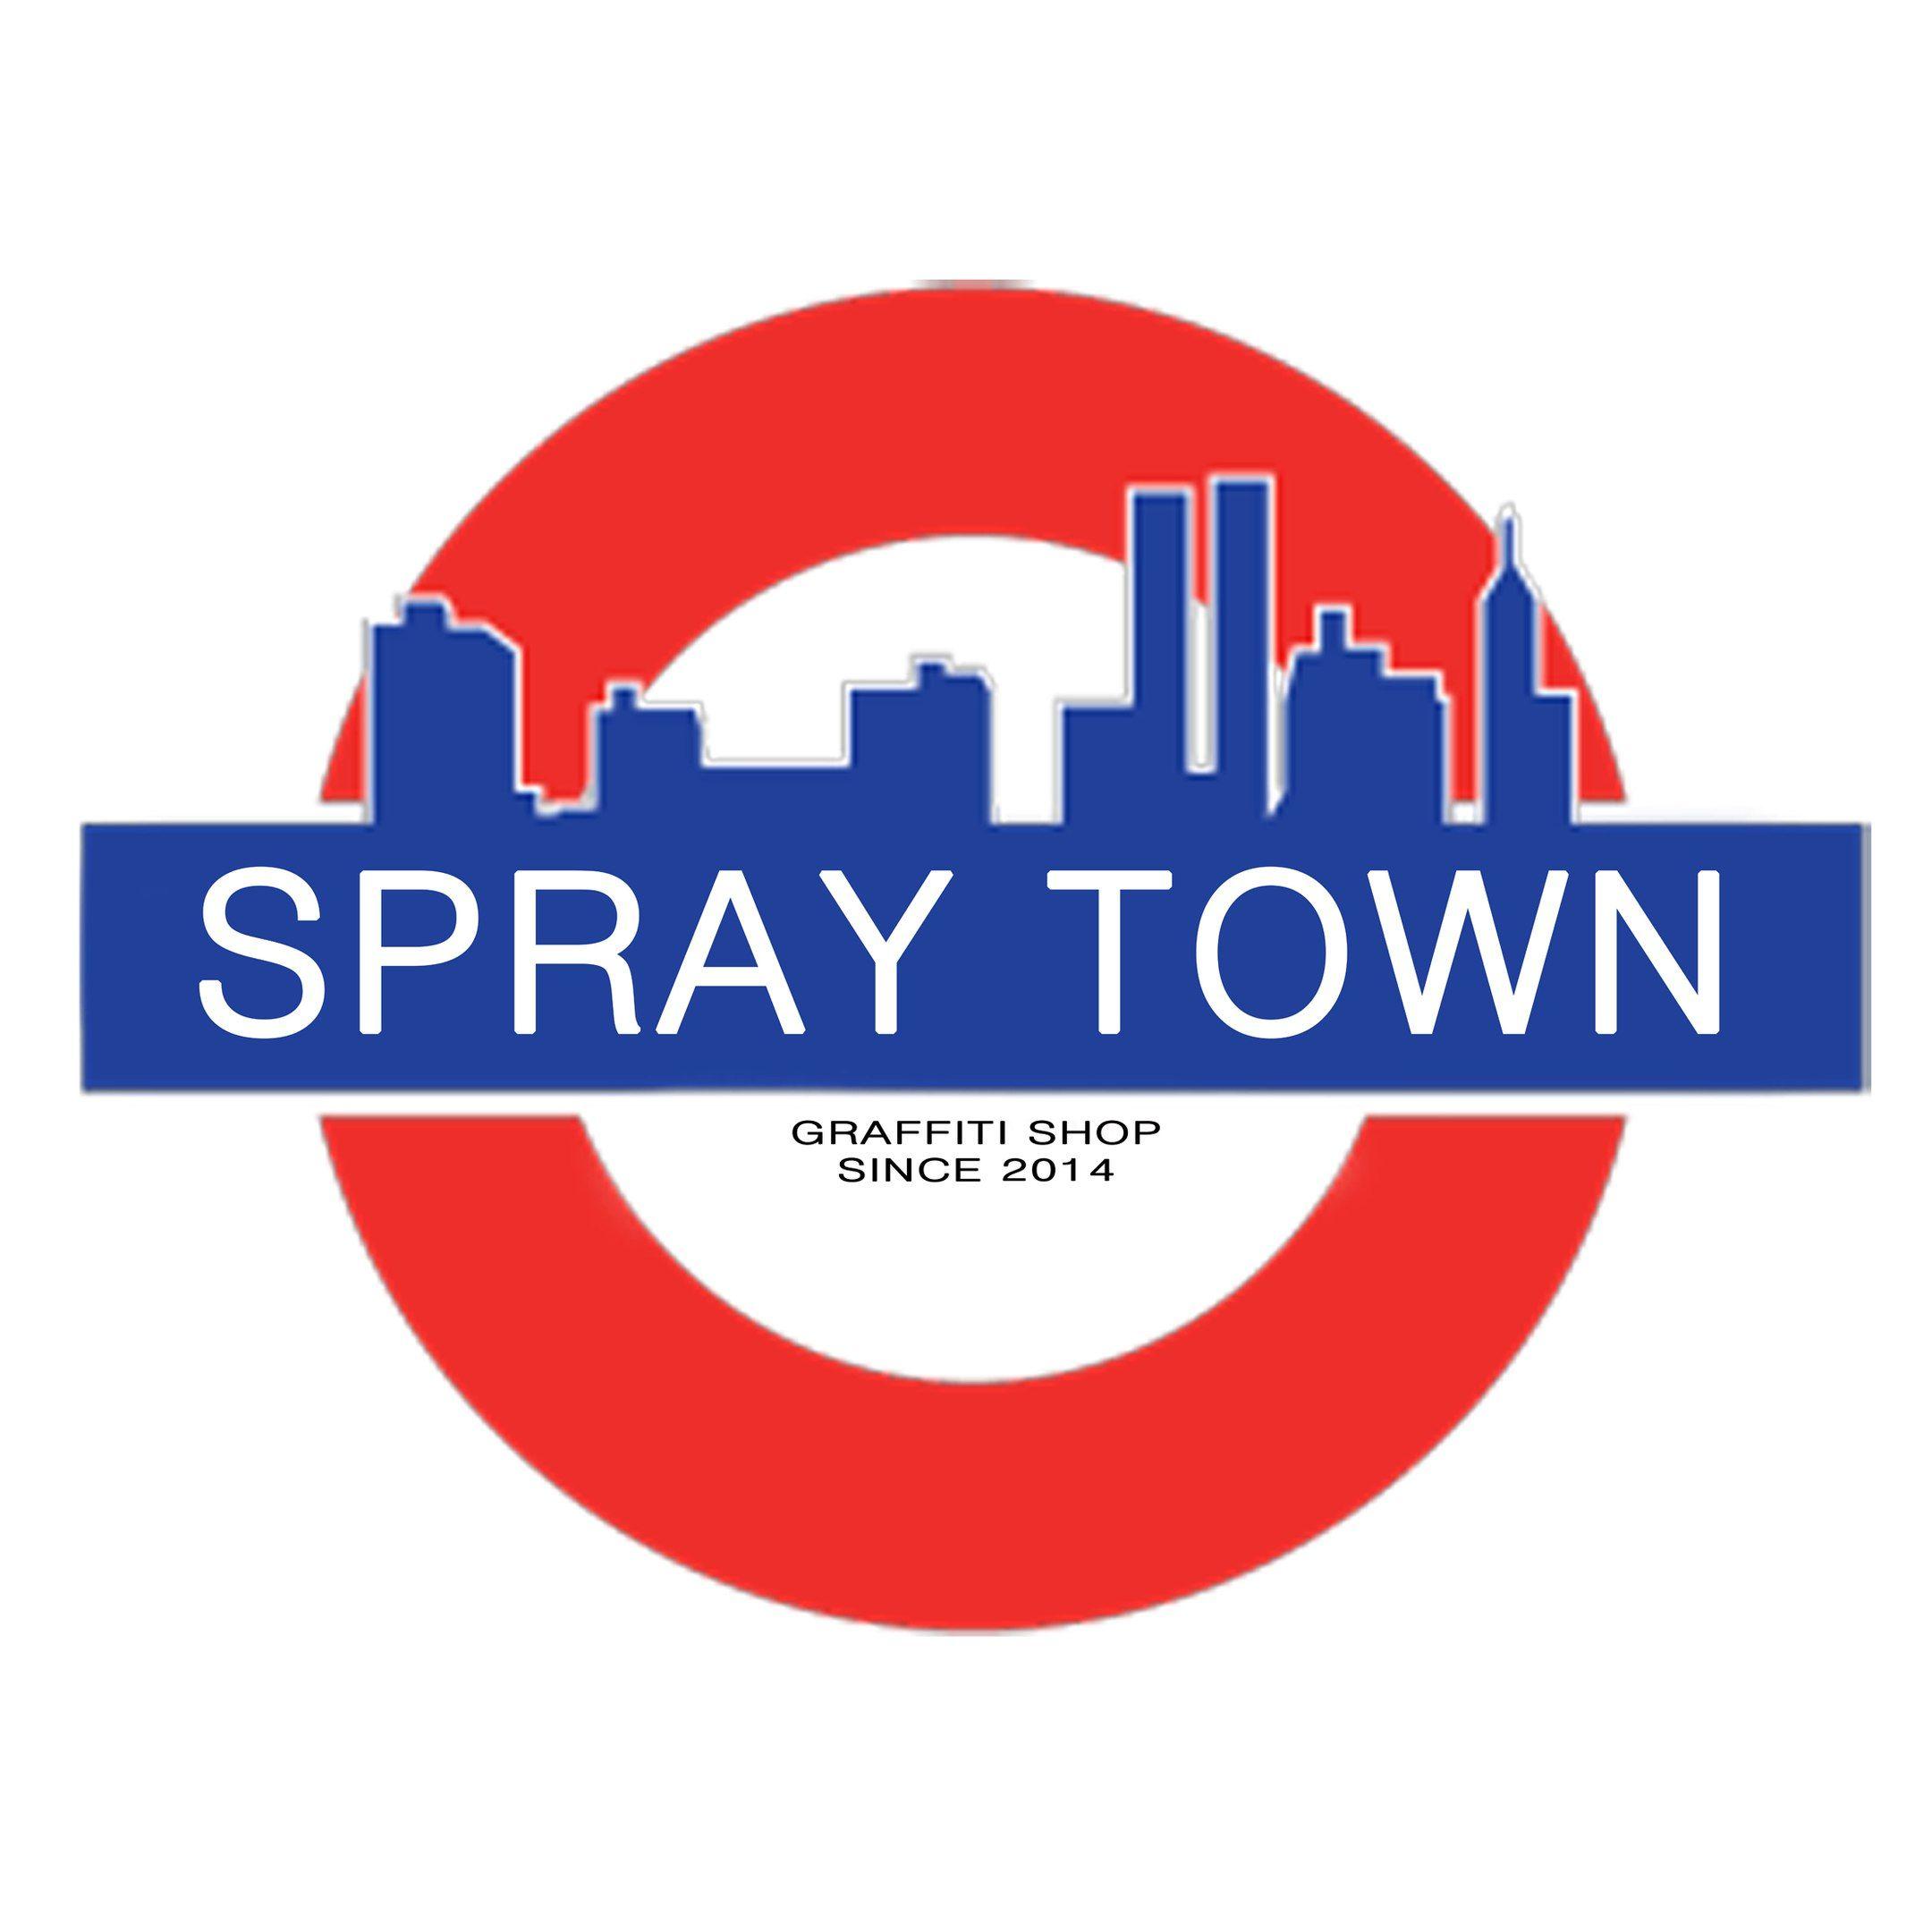 ae2b91c9 Spray Town (spraytownshop) on Pinterest